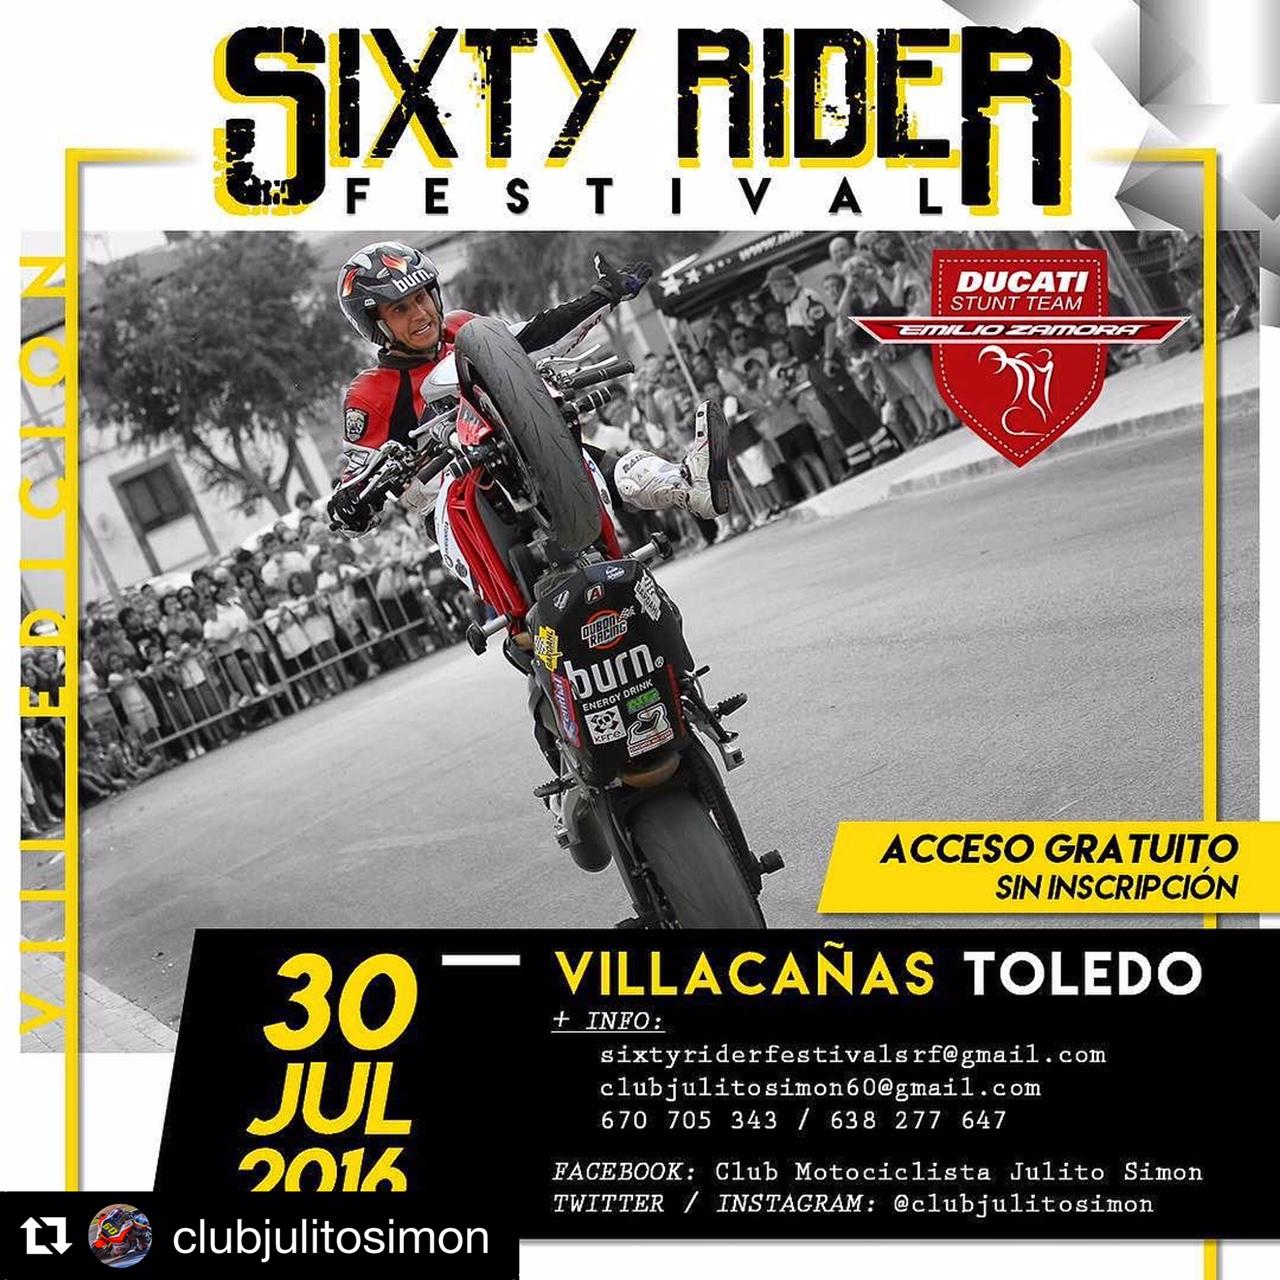 9-sixty-rider-festival_2016_julian_simon_club_emilio_zamora_ducati_stunt_team_motor_show_freestyle_moto_espectaculo_exhibicion_poster